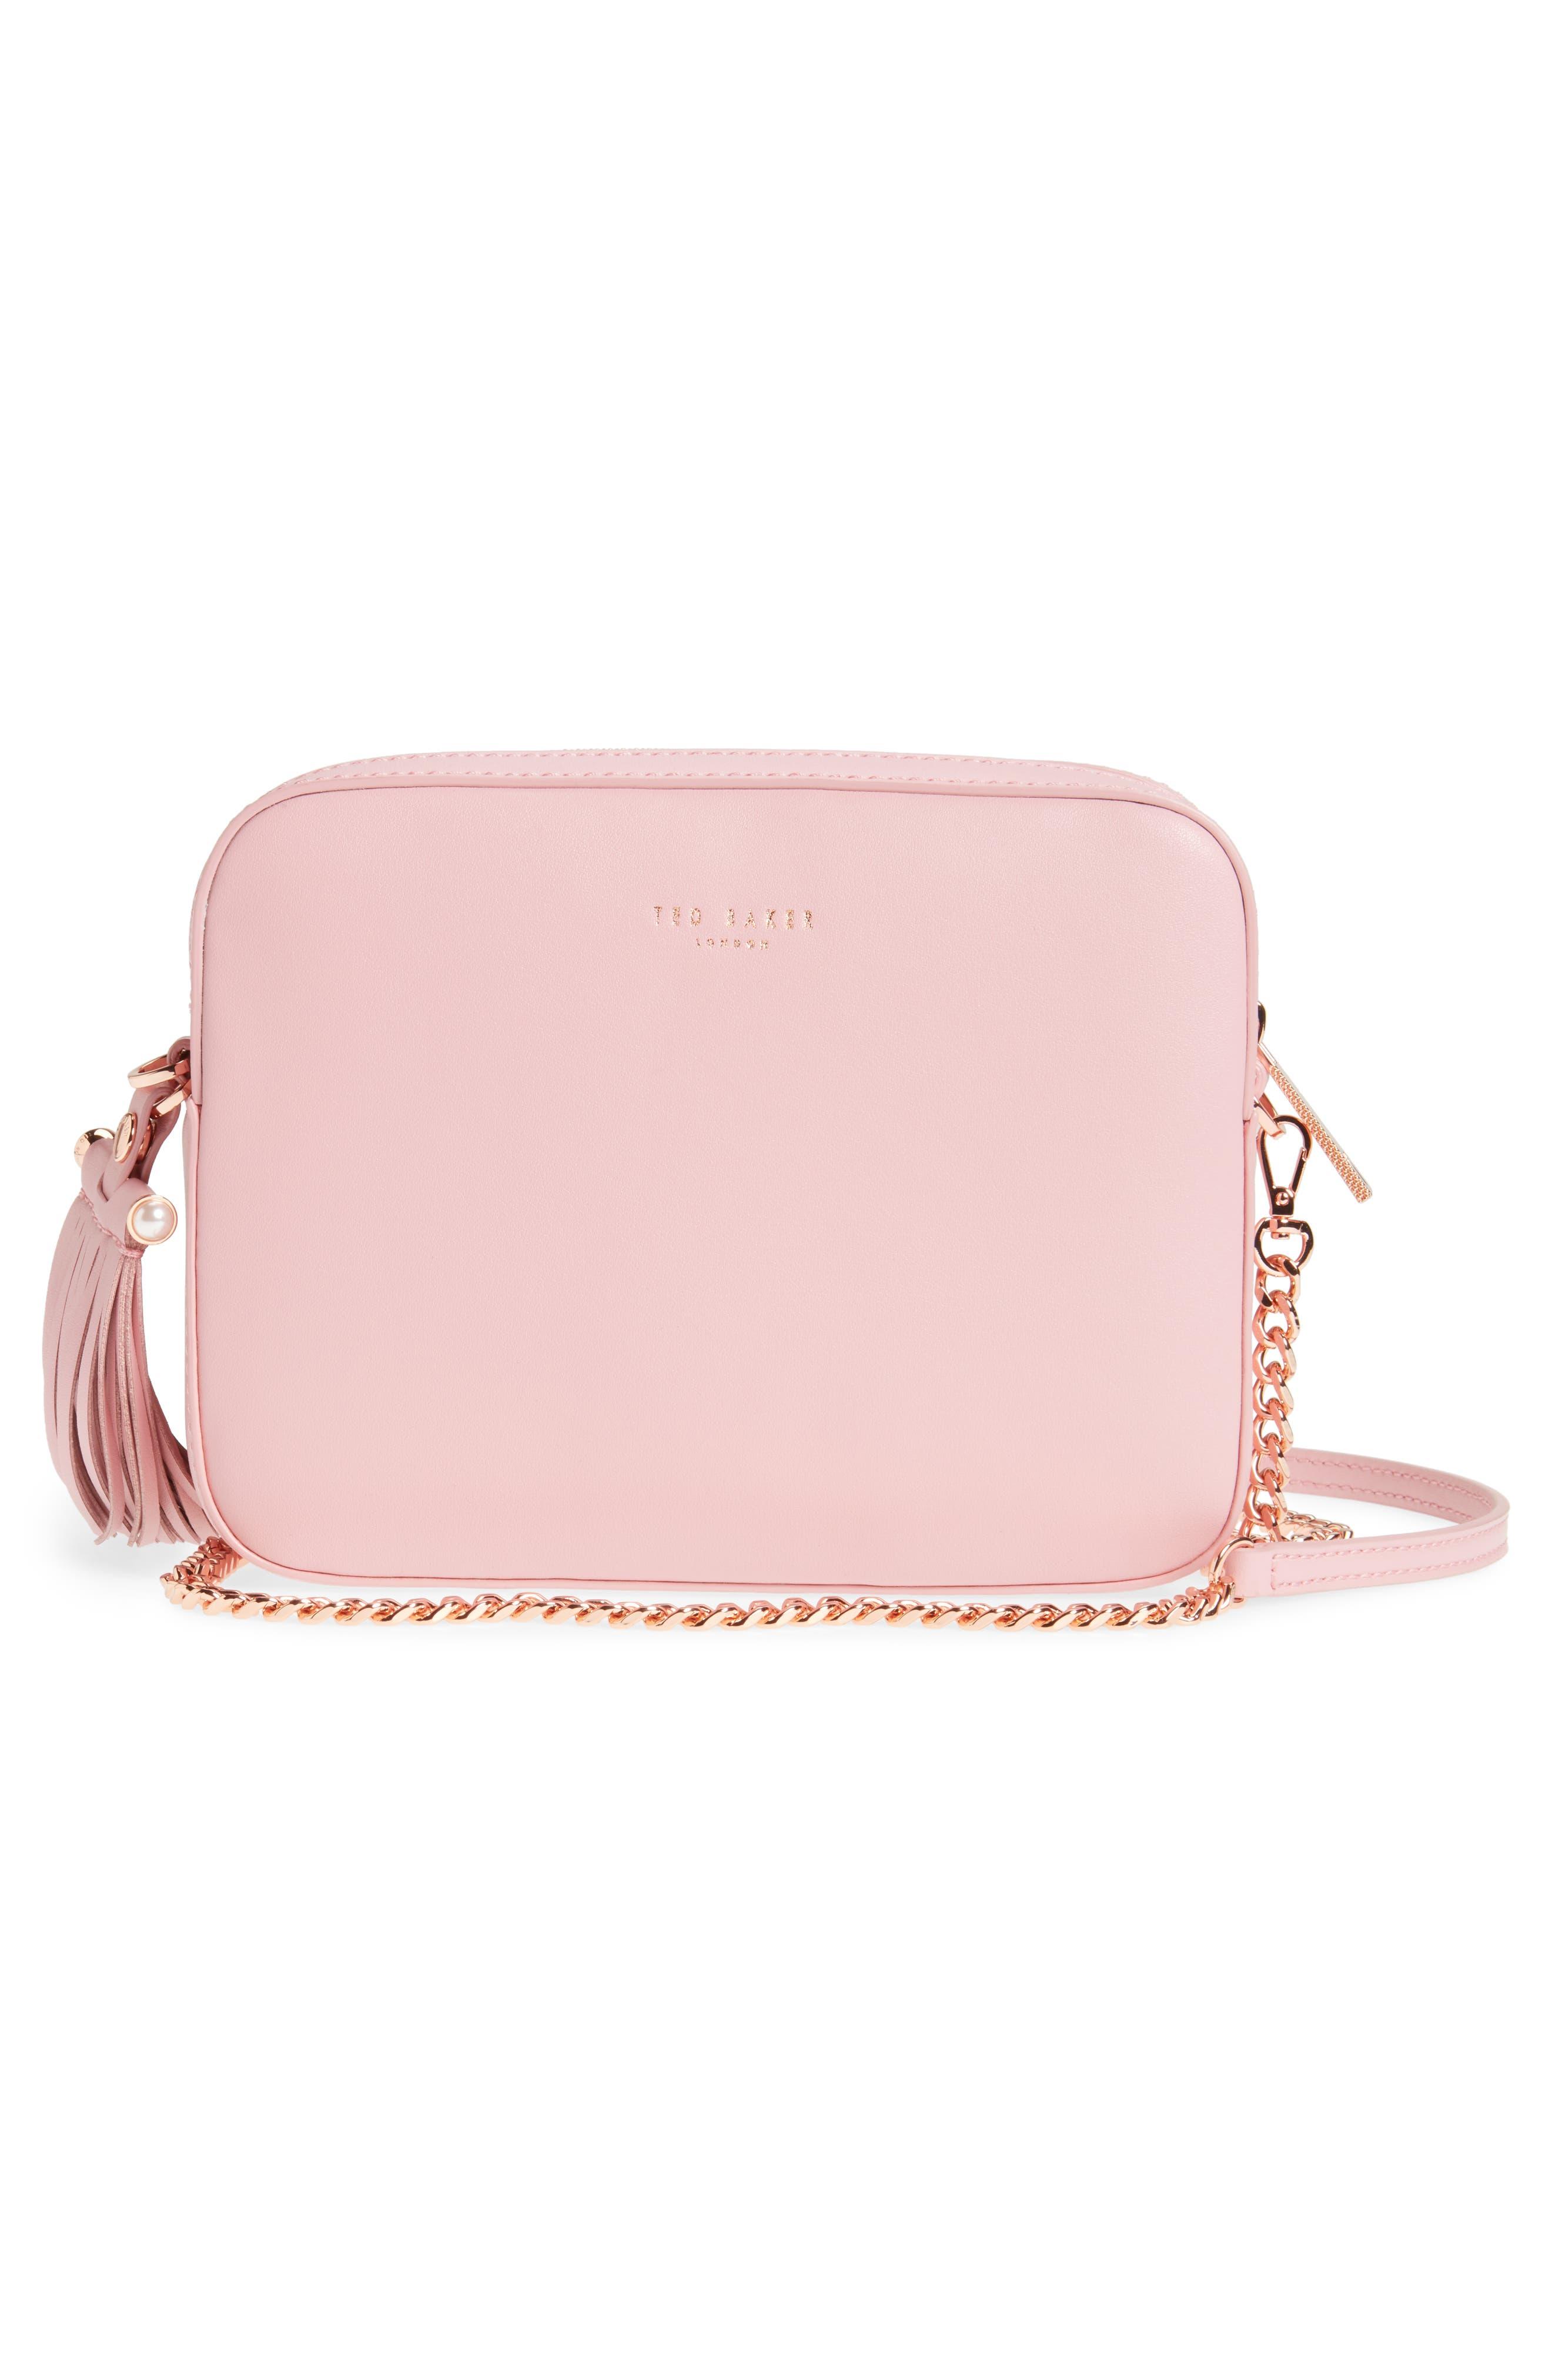 Alessia Imitation Pearl Embellished Leather Crossbody,                             Alternate thumbnail 3, color,                             Dusky Pink